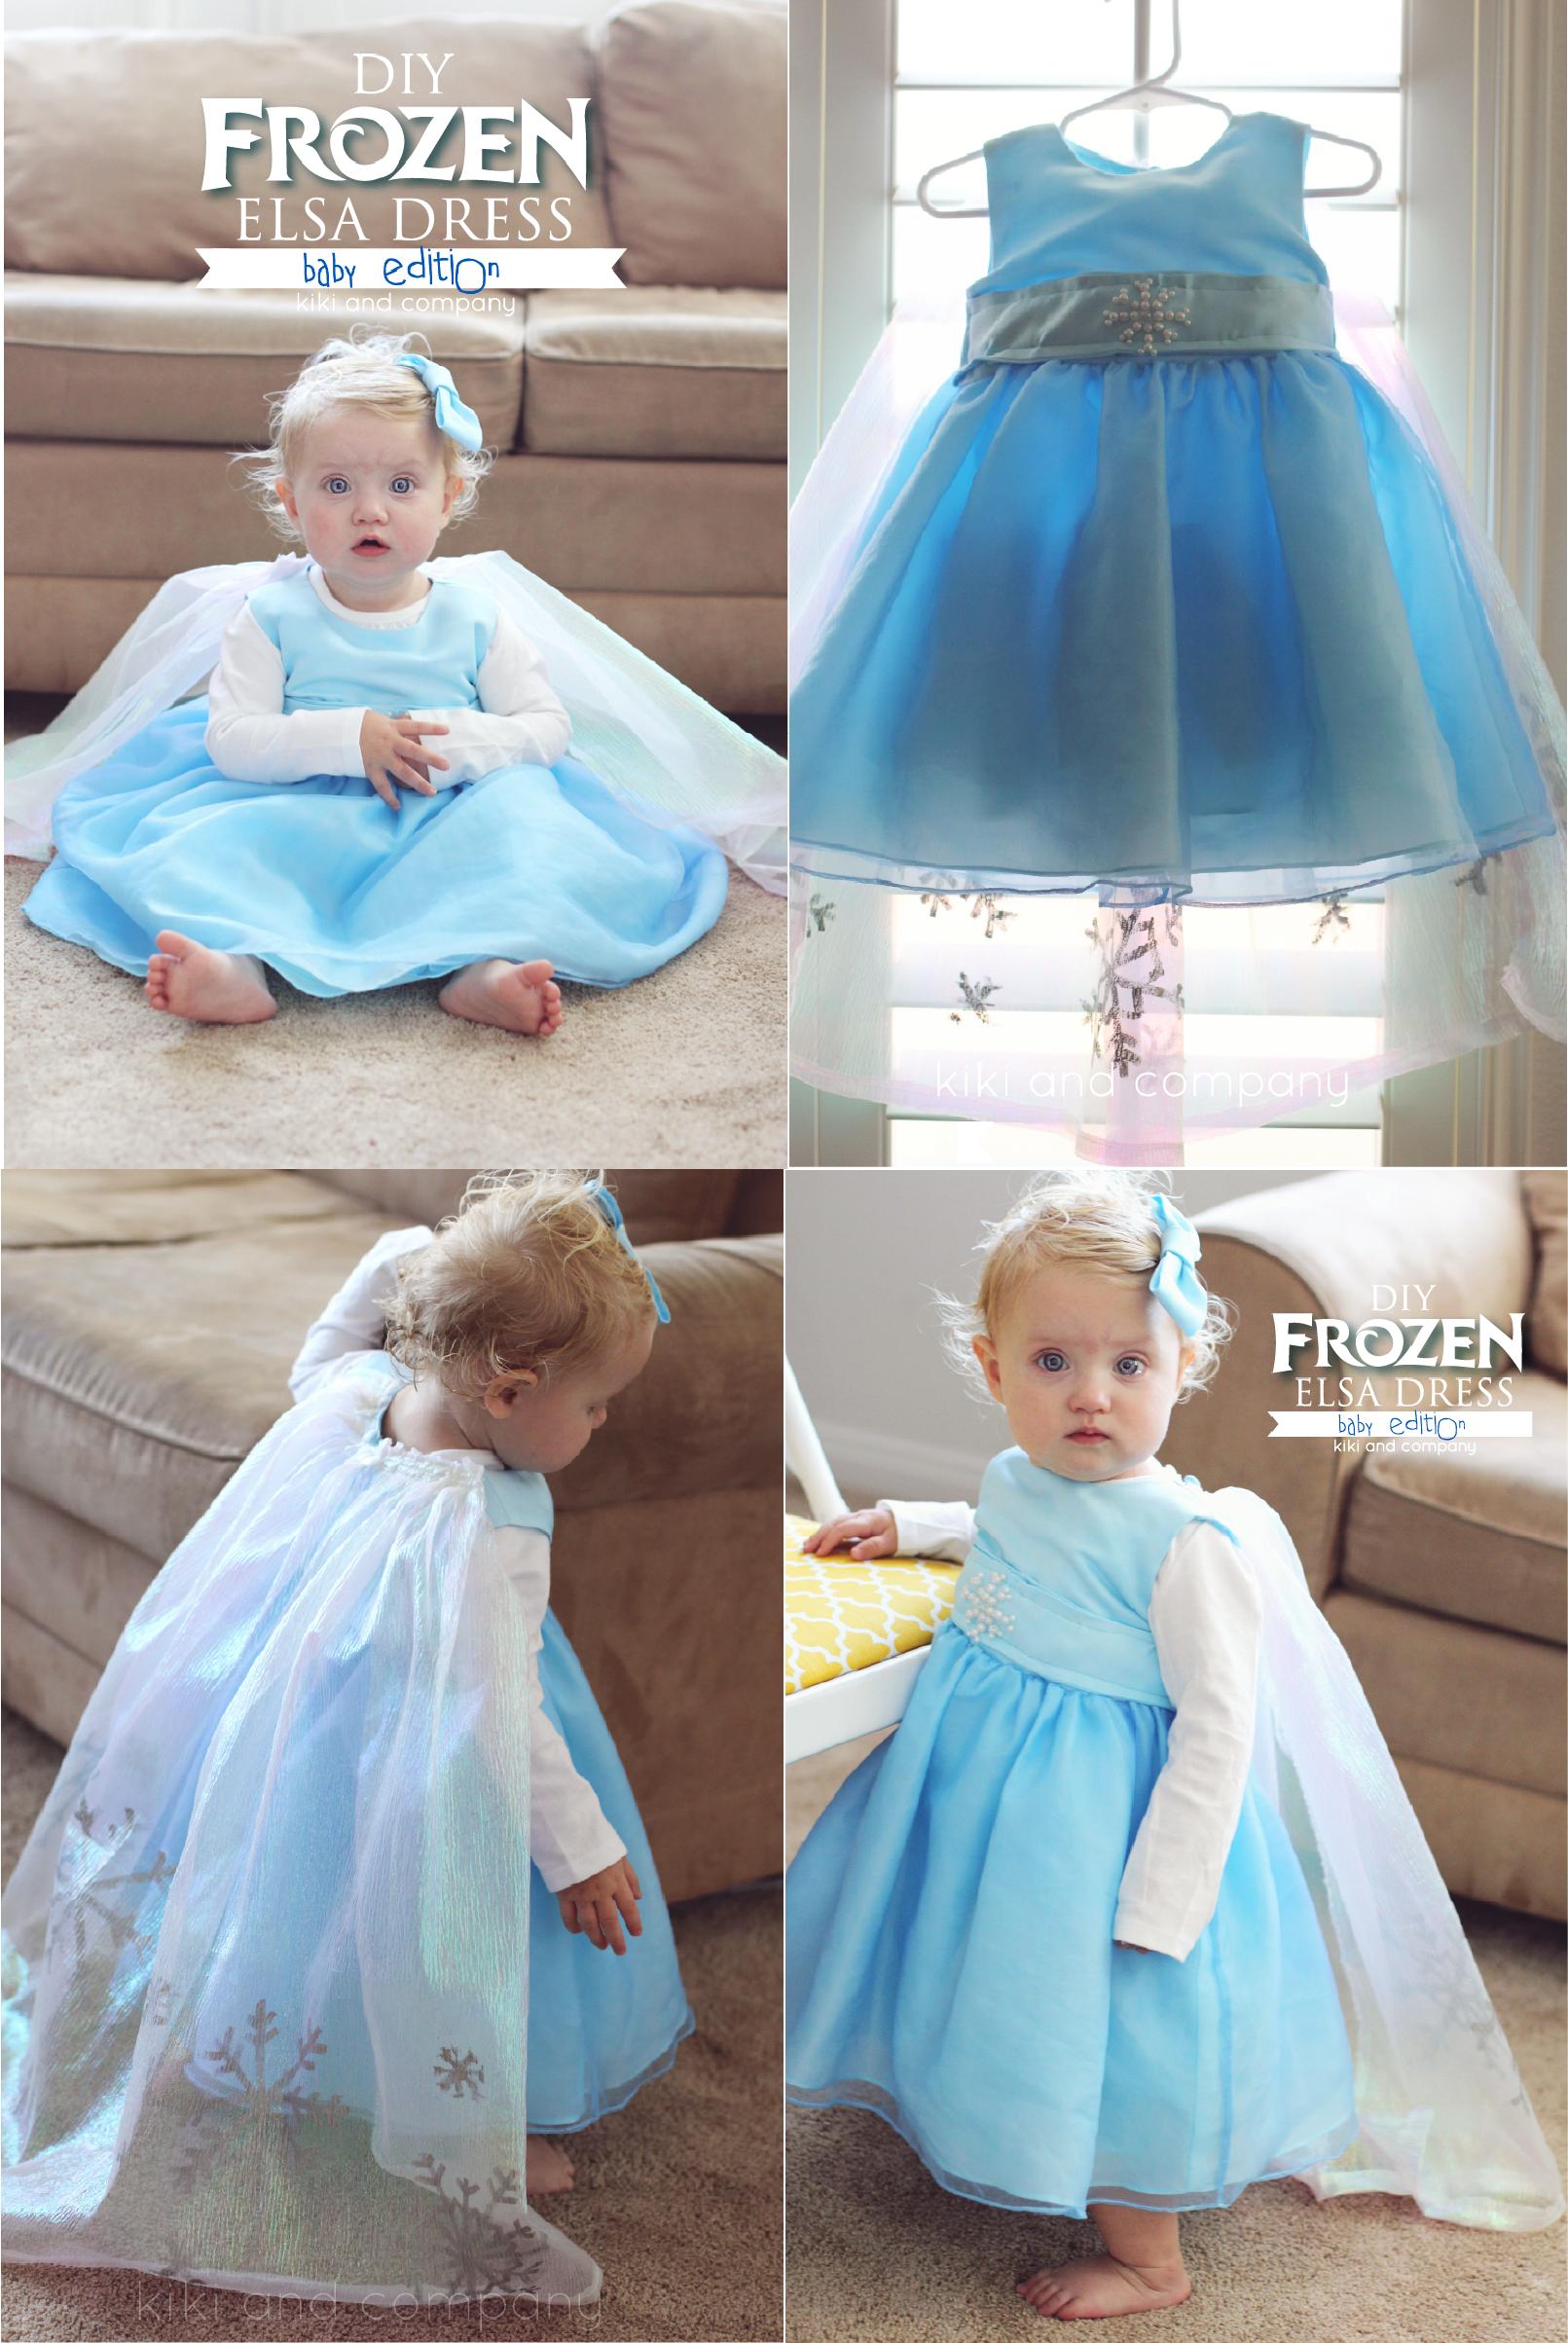 DIY Frozen Baby Elsa Dress. Perfect for your littlest princess ...